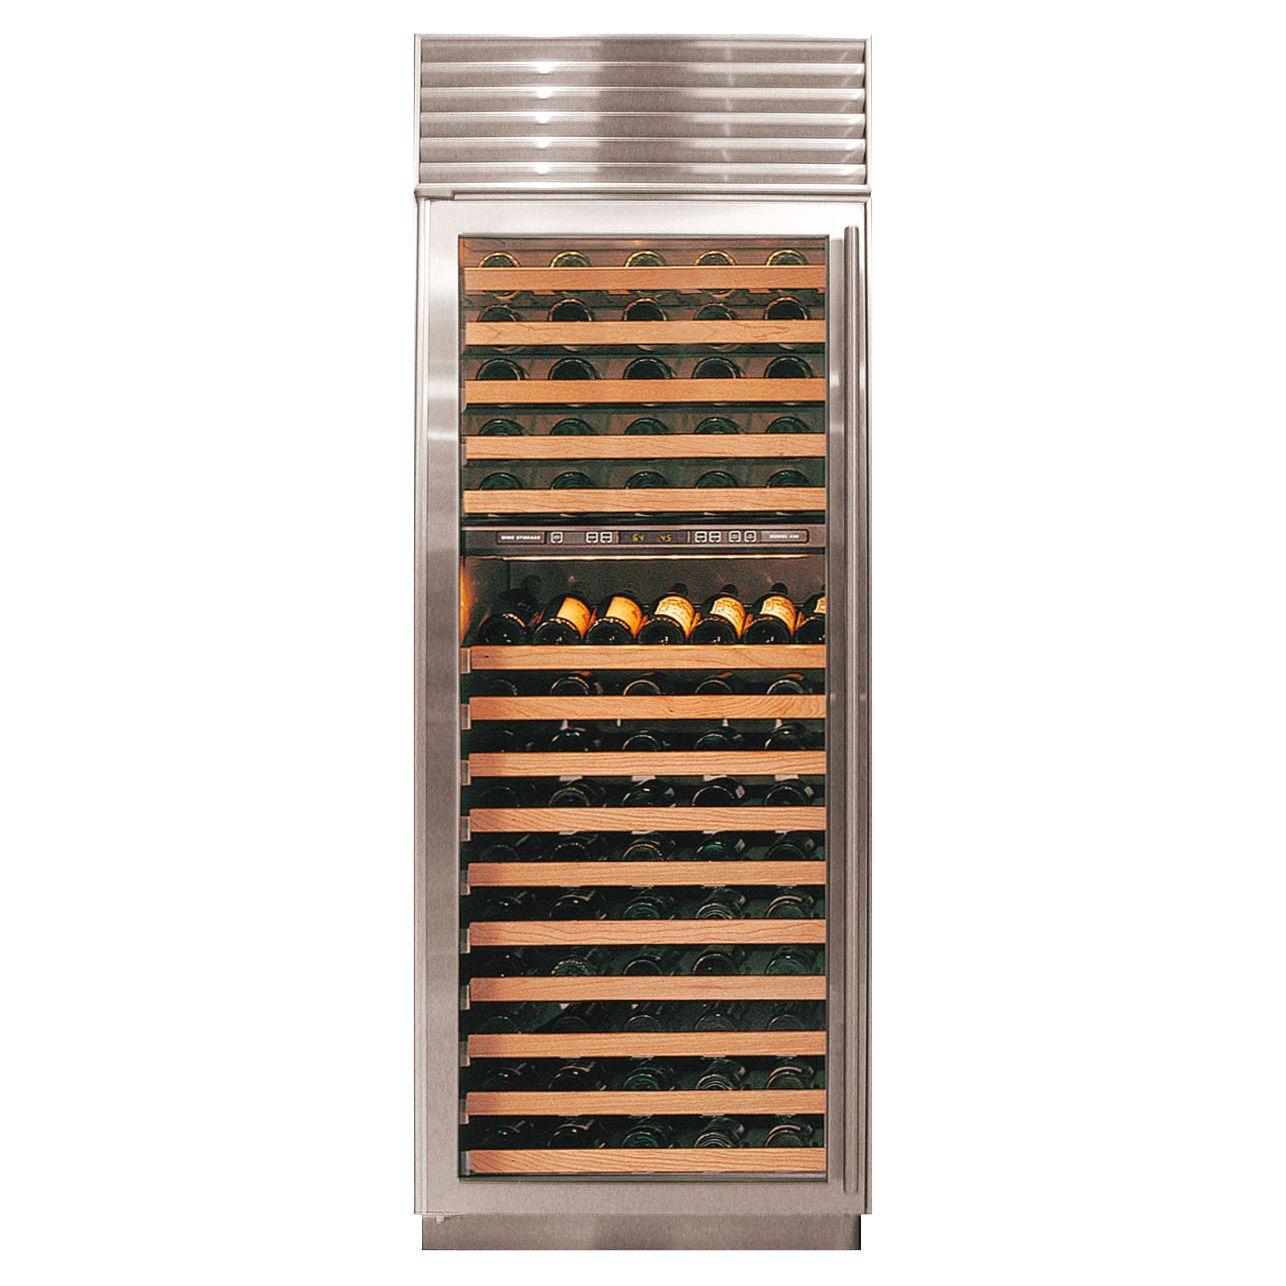 Sub-Zero Sub-Zero ICBWS30/S/TH/LH Wine Cabinet